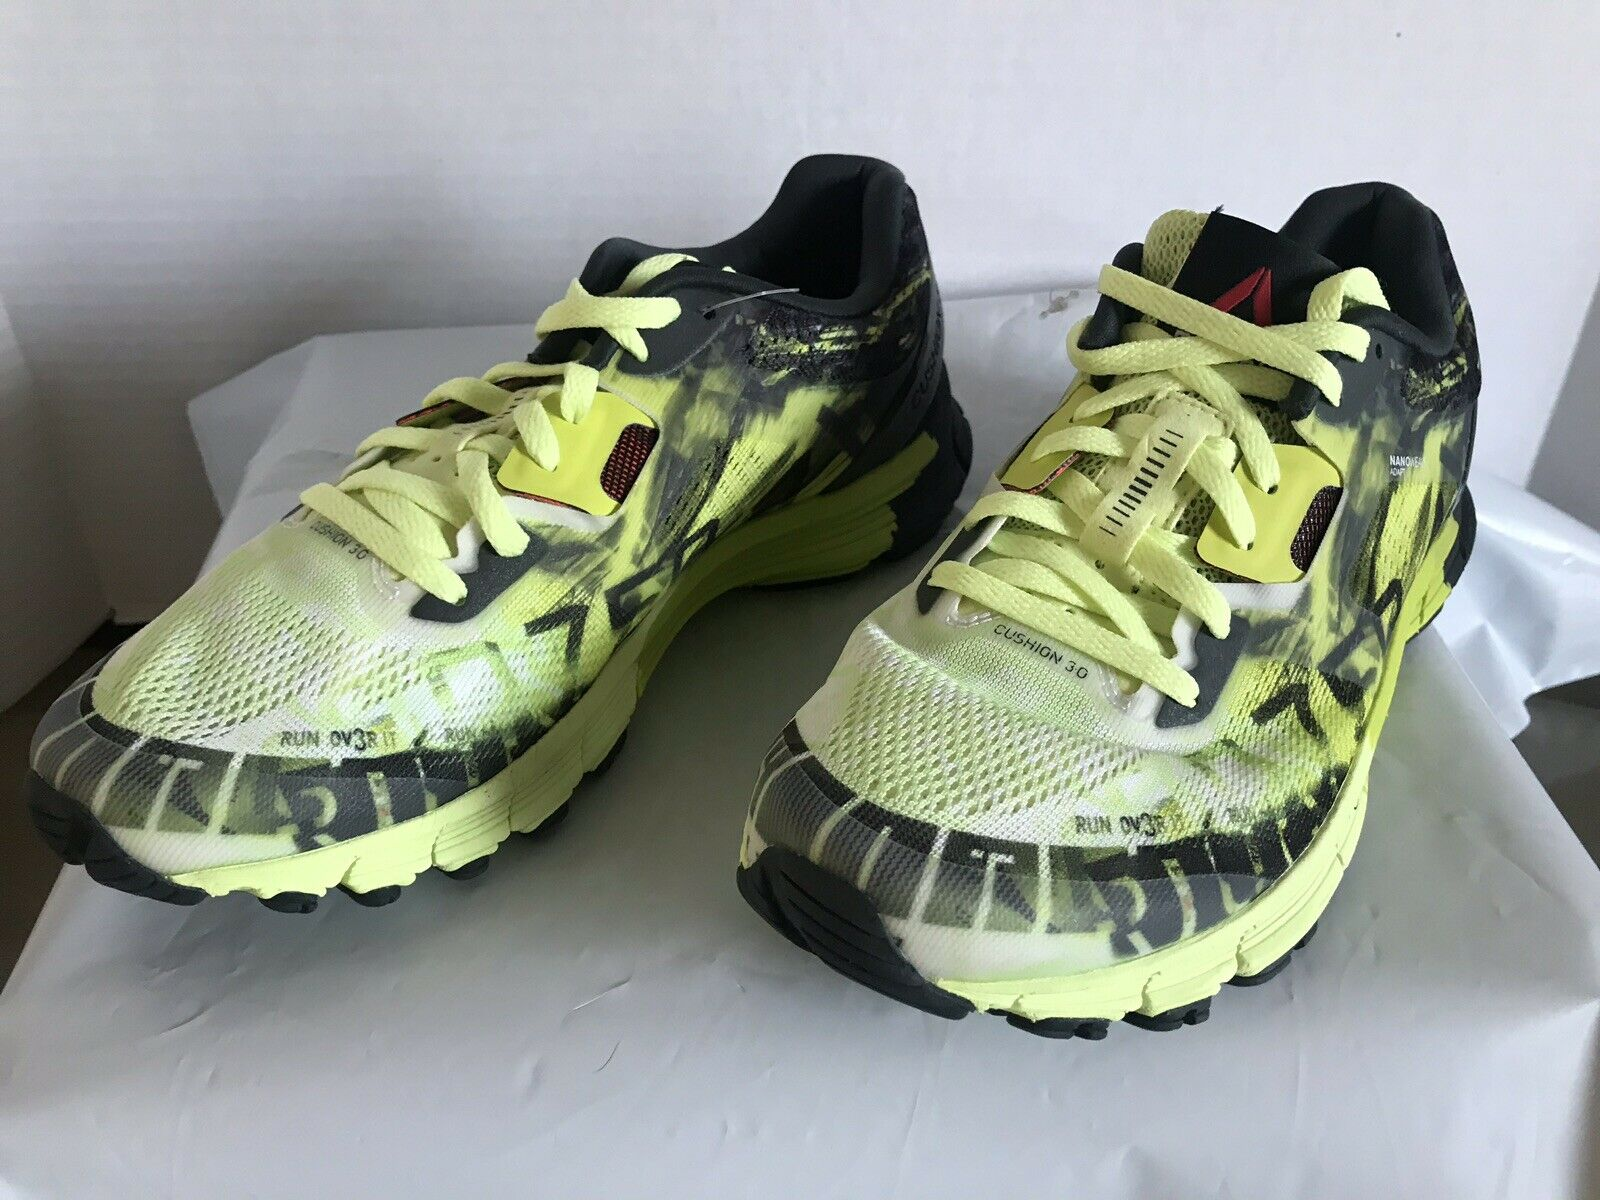 Reebok Lths One Cushion 3.0 Ag, Women's Running shoes size 7 volt